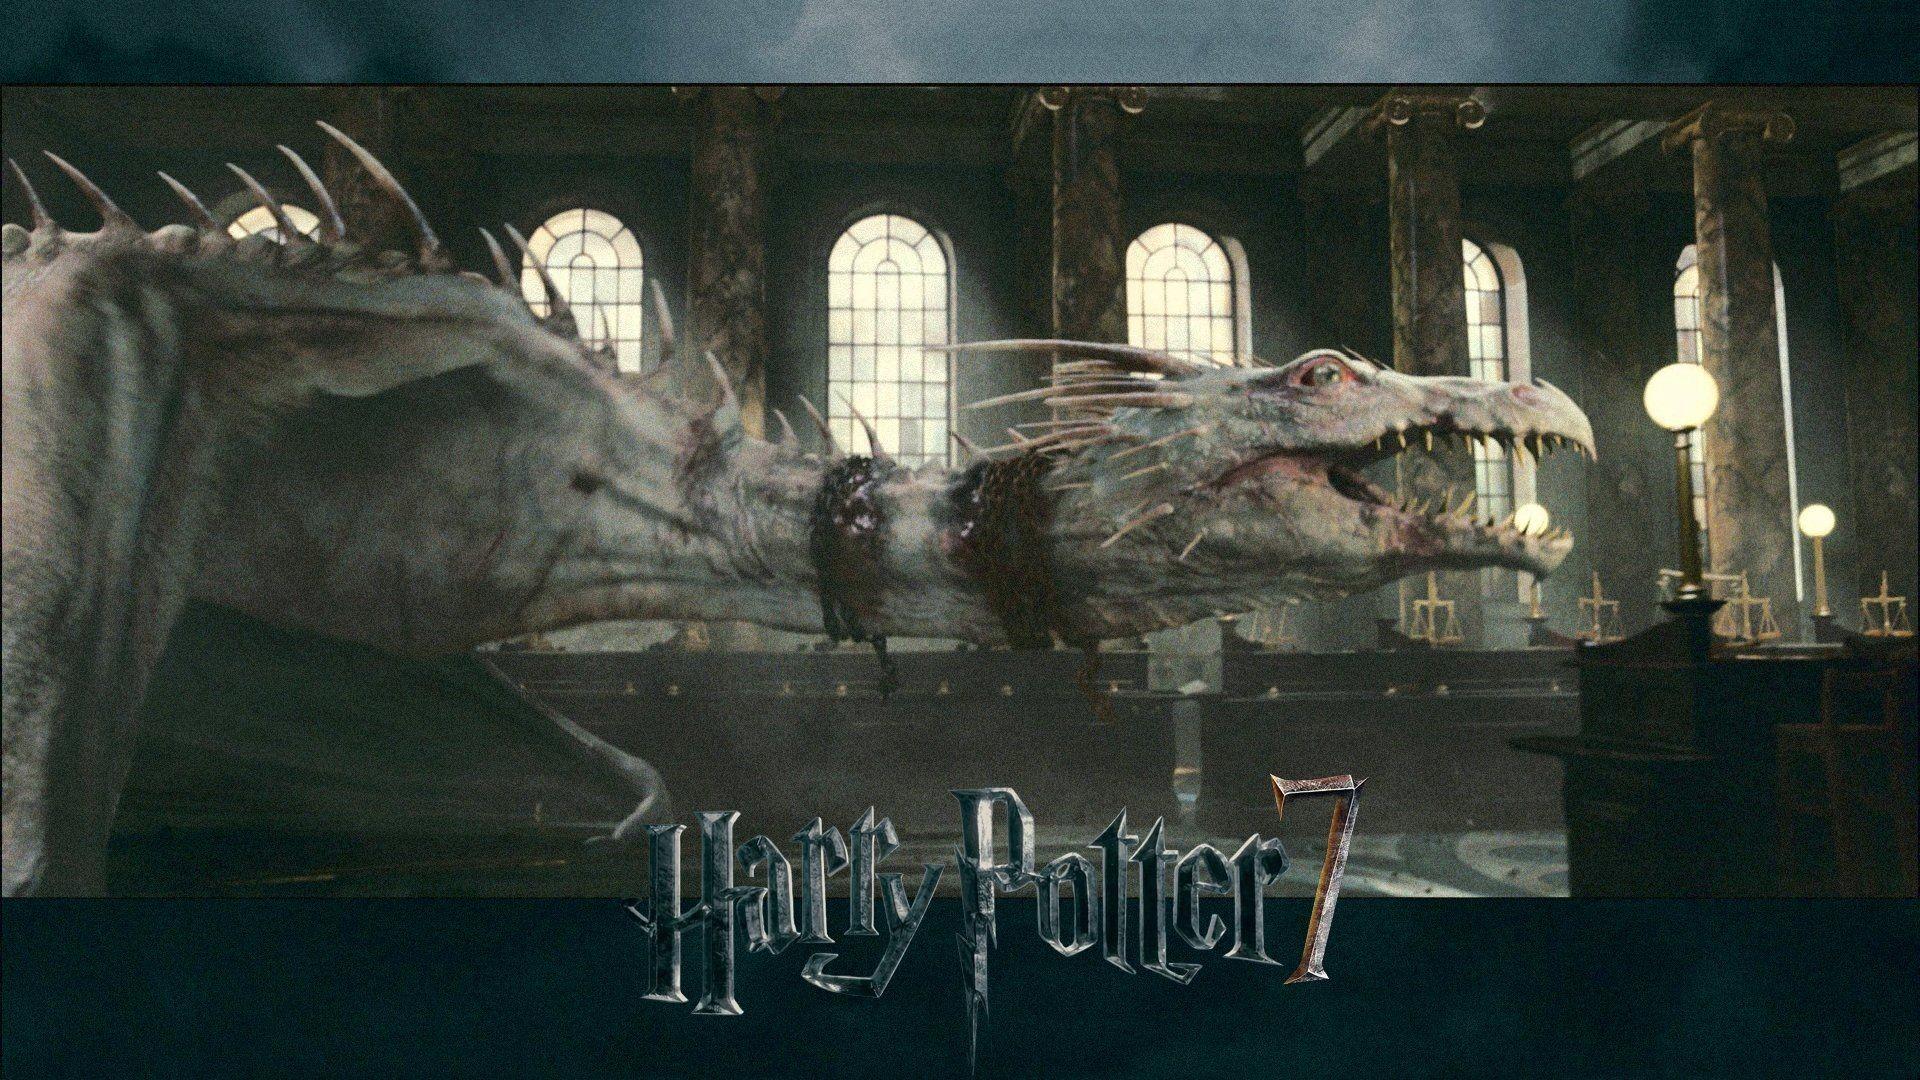 Wonderful Wallpaper Harry Potter Christmas - 178074  Image_503235.jpg